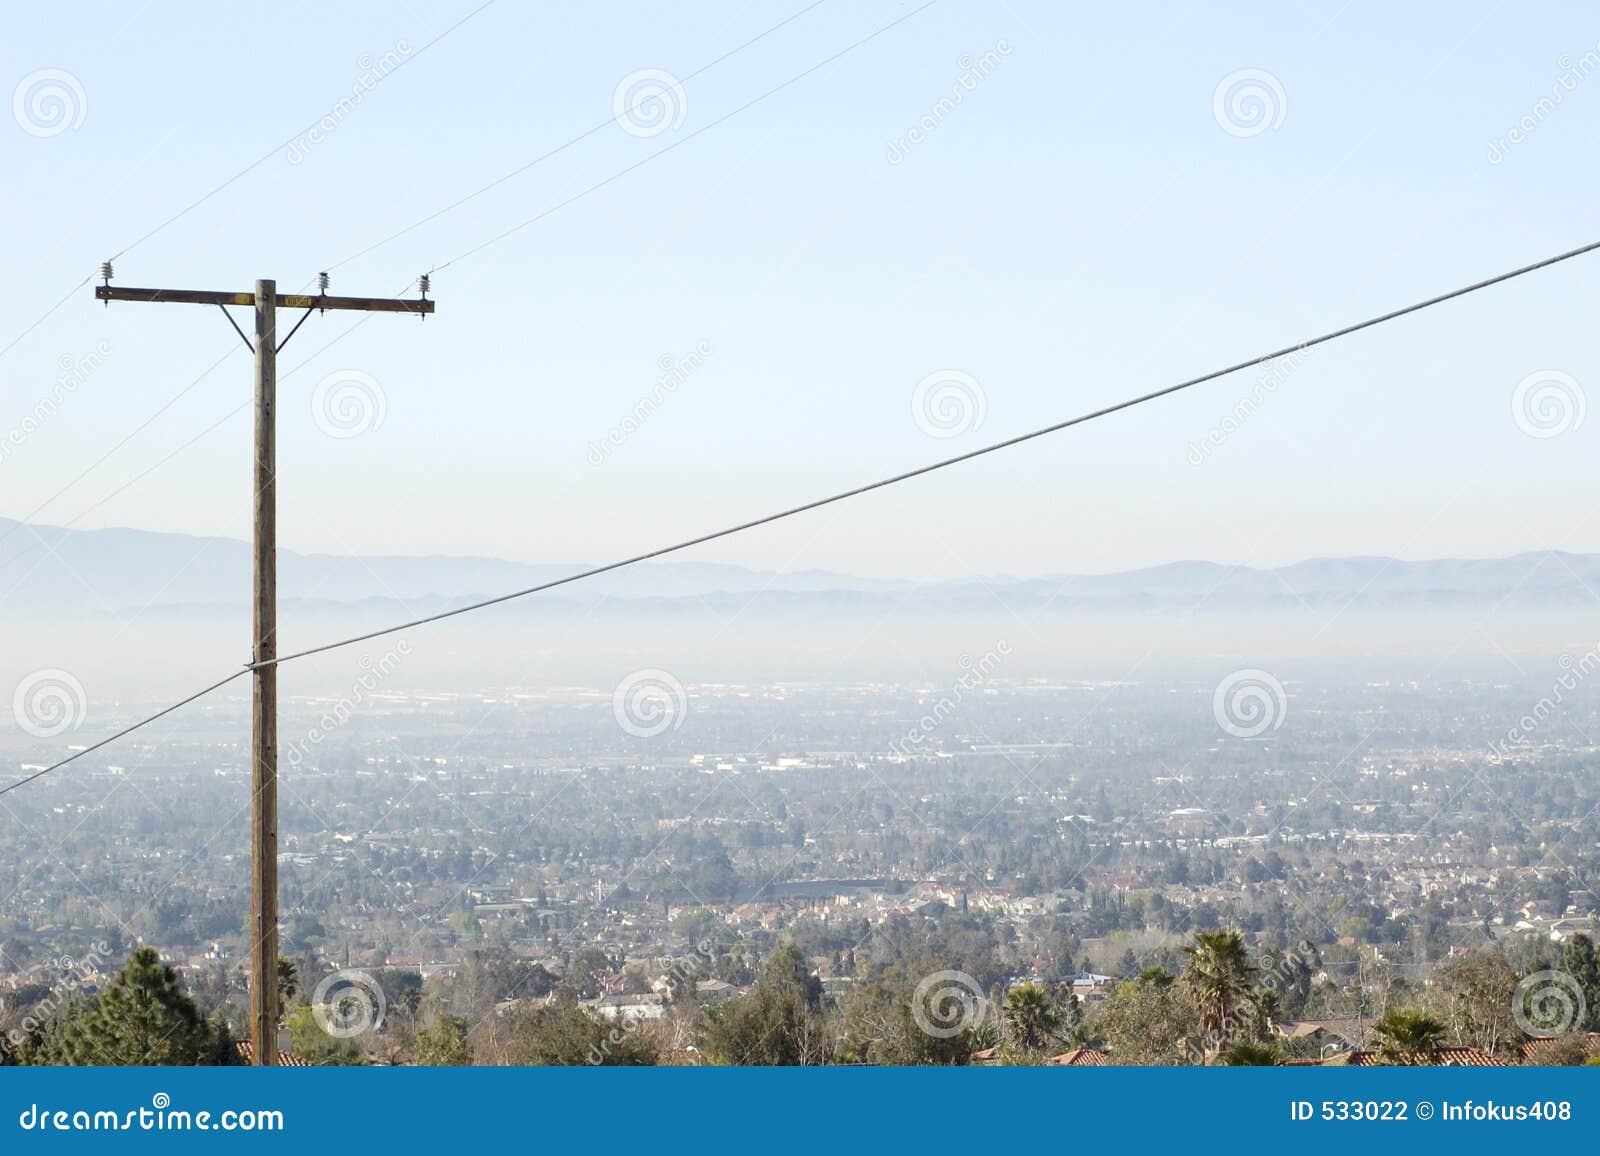 Download 烟雾城镇 库存照片. 图片 包括有 航空, 危险等级, 背包, 阴霾, 臭氧, 危害, 墙纸, 视图, 生活 - 533022